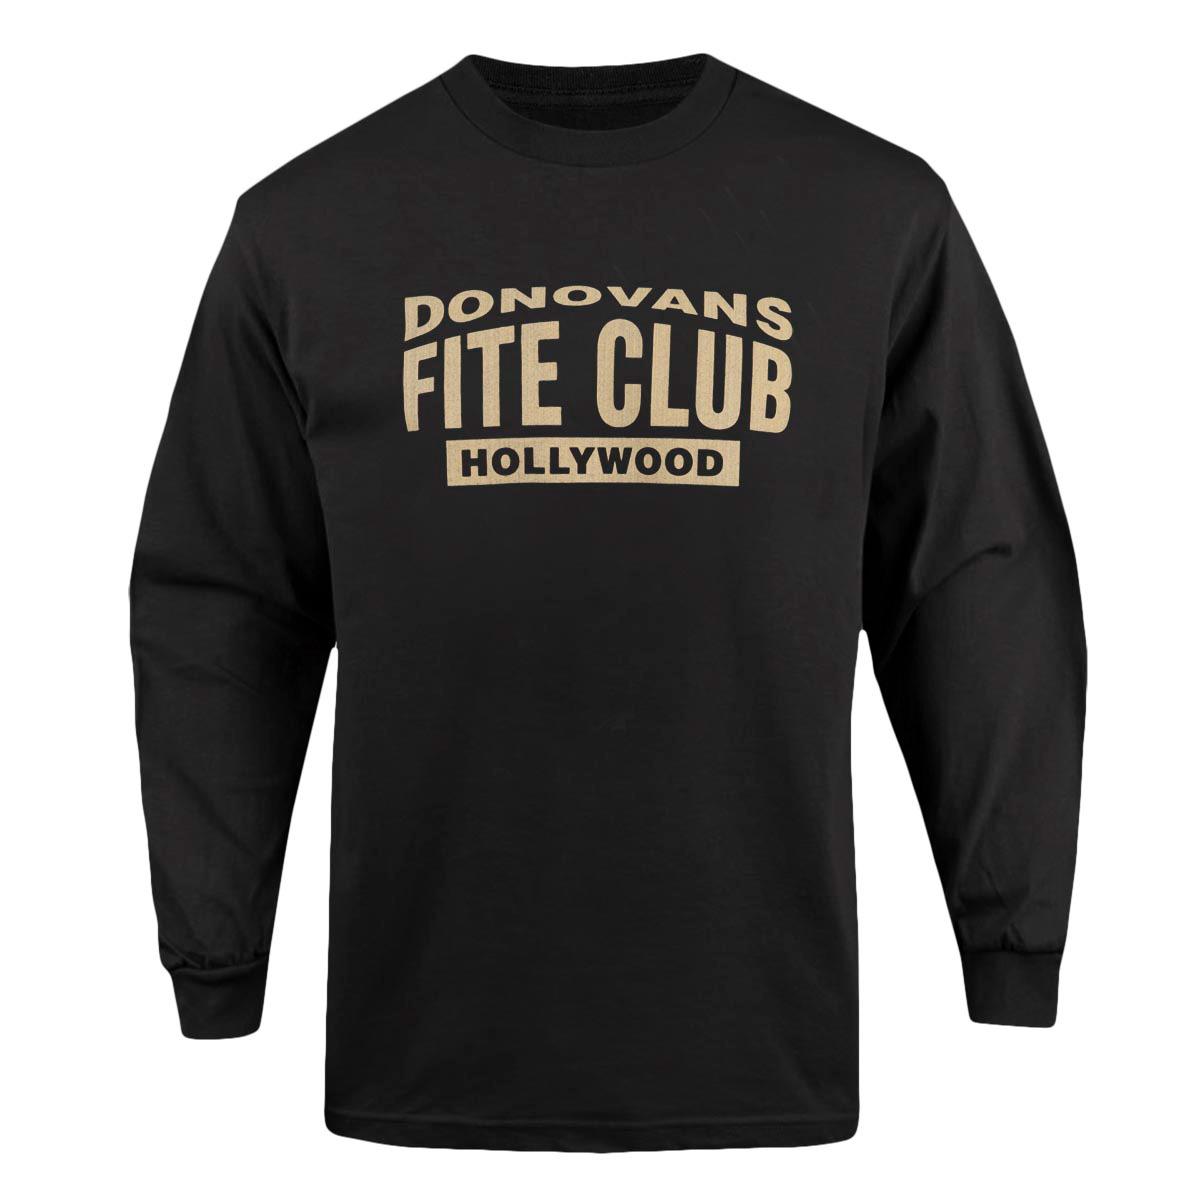 Ray Donovan Fite Club Long Sleeve T-Shirt